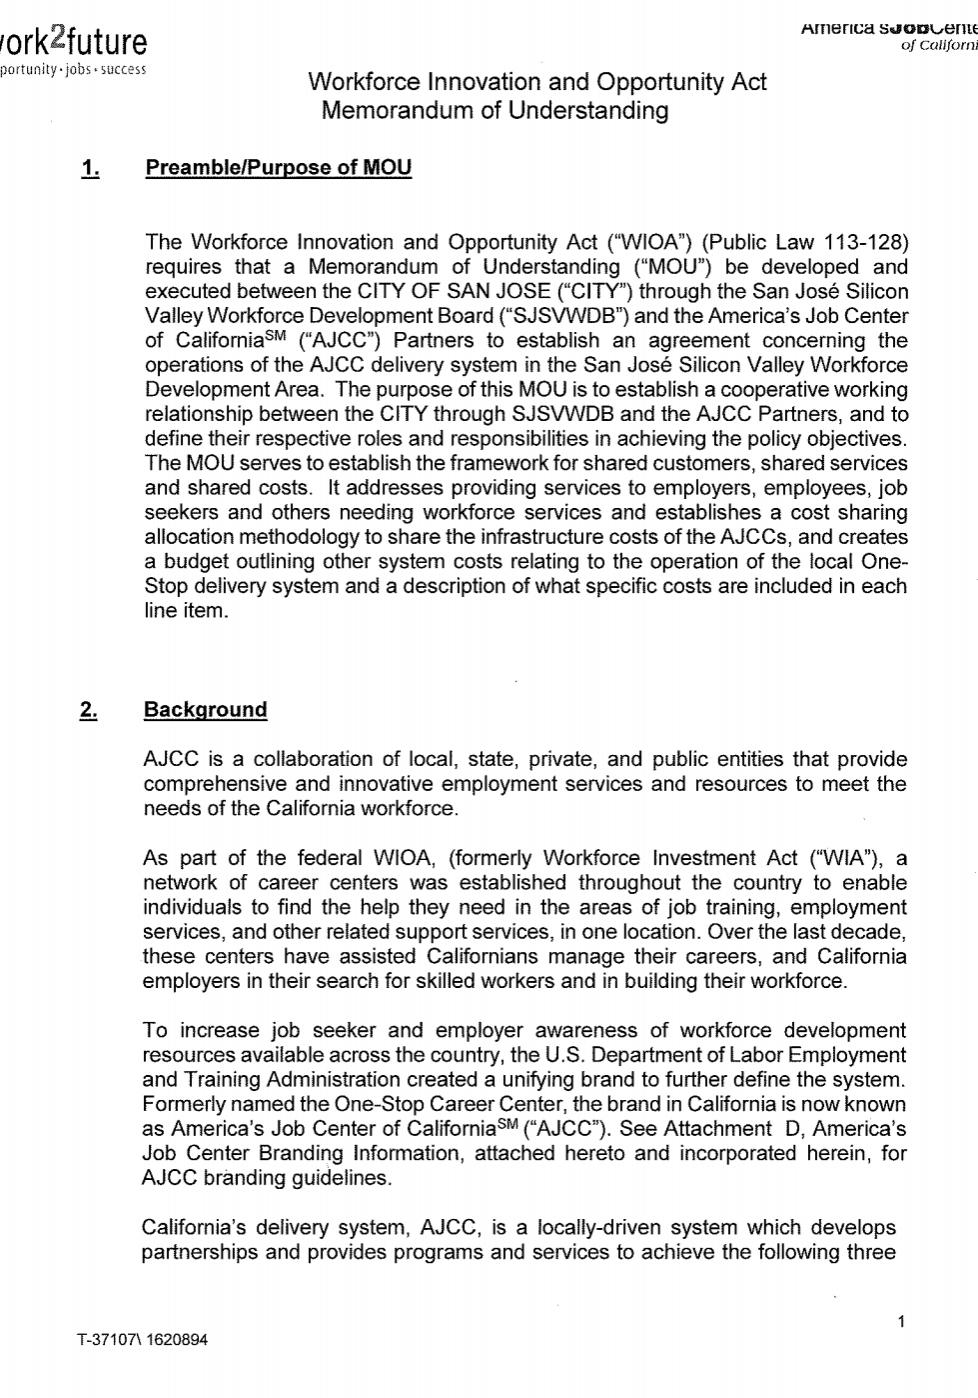 Memorandum of Understanding | California Employment Development Department